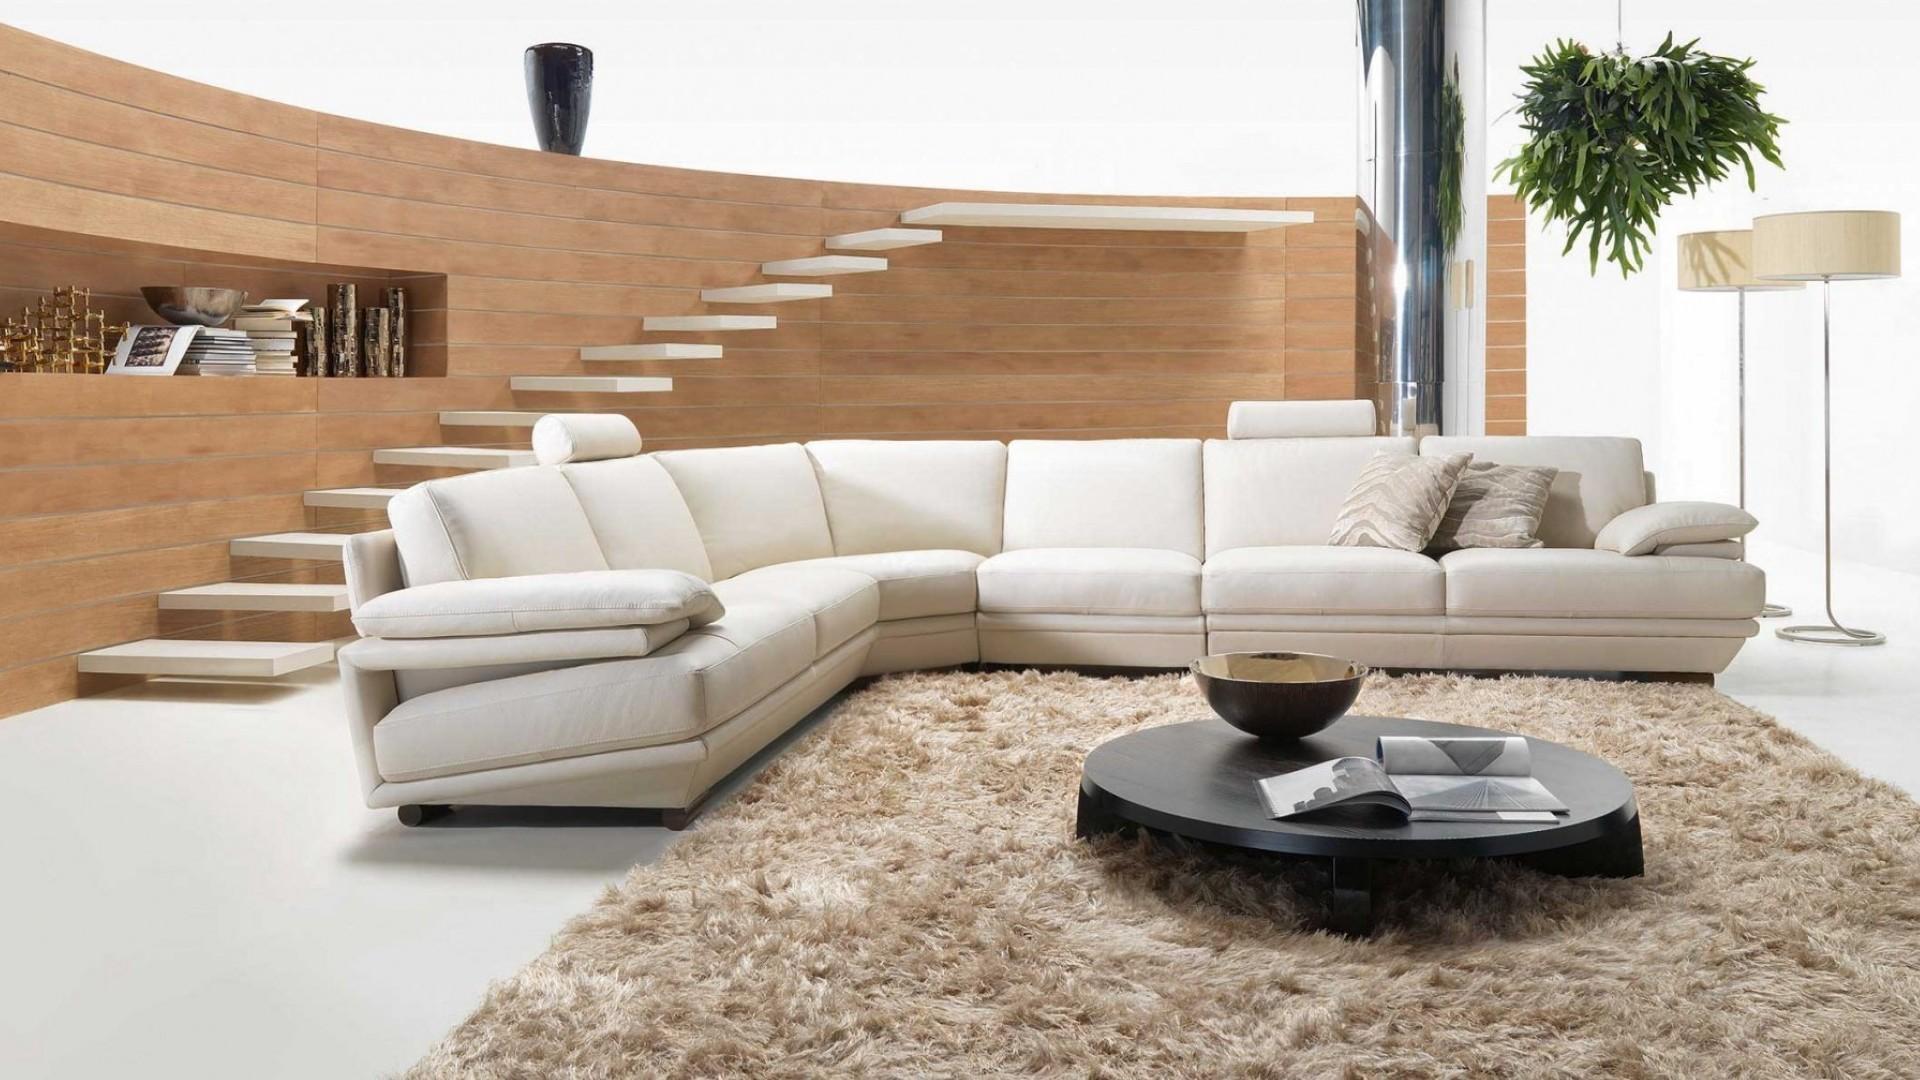 Natuzzi Leather Sofas Ireland | Sofas Decoration Throughout Natuzzi Microfiber Sectional Sofas (Image 12 of 20)